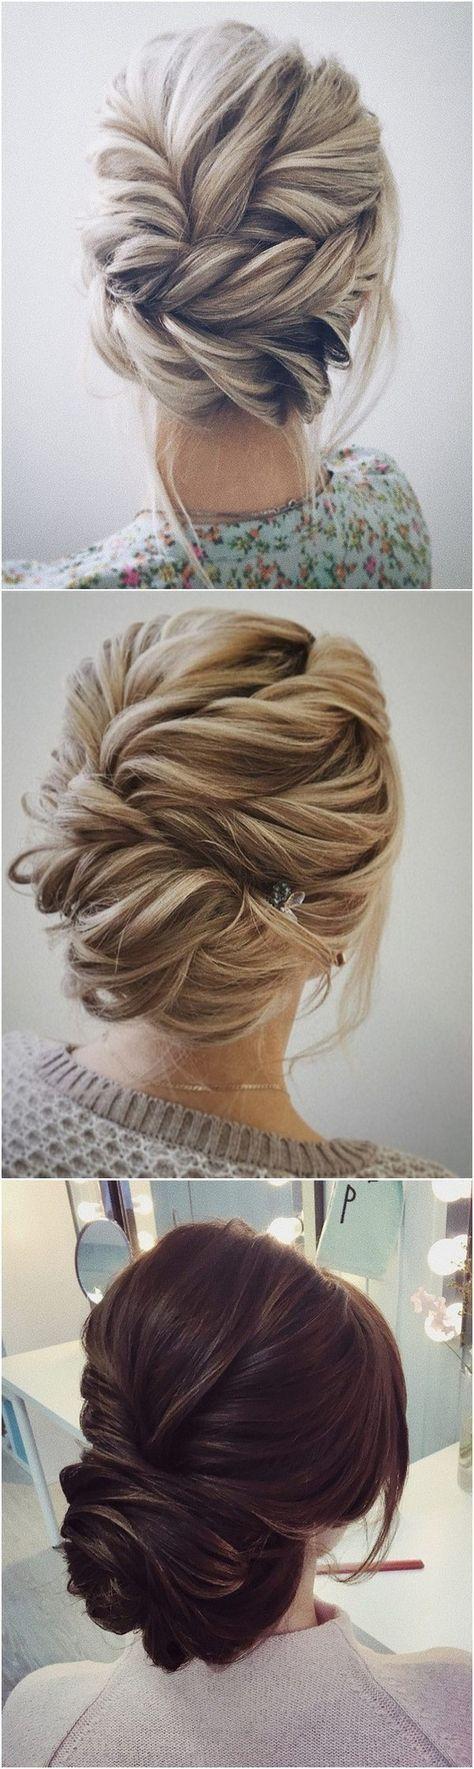 Bridepower weddings pinterest hair style wedding